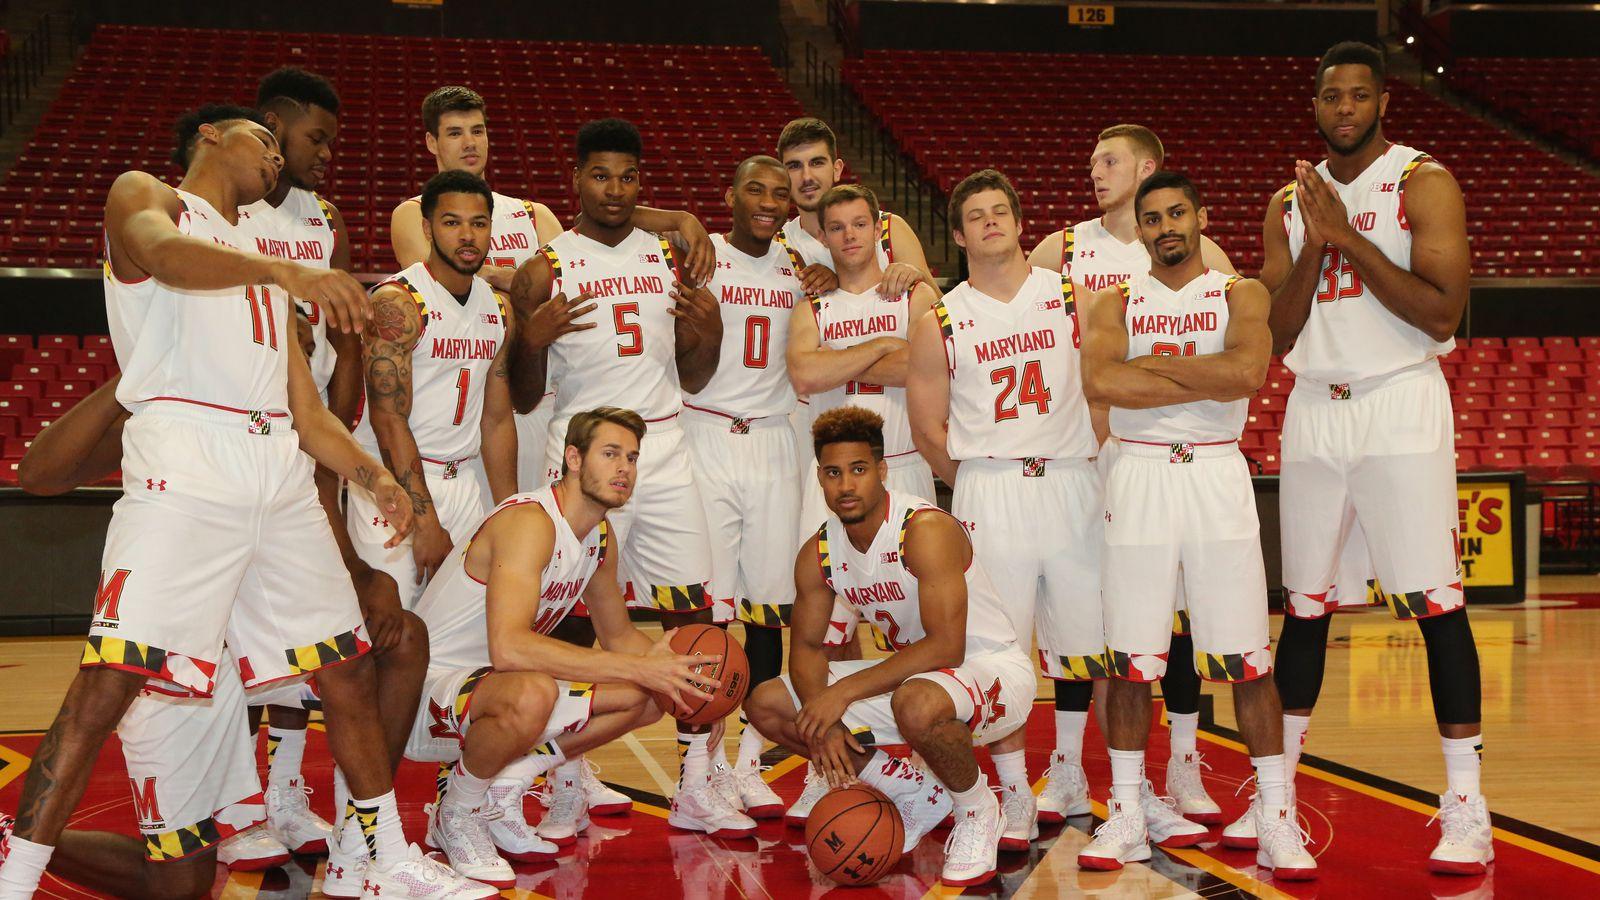 Uk Men S Basketball 2018 2019 Schedule: Maryland Terrapins Wikipedia